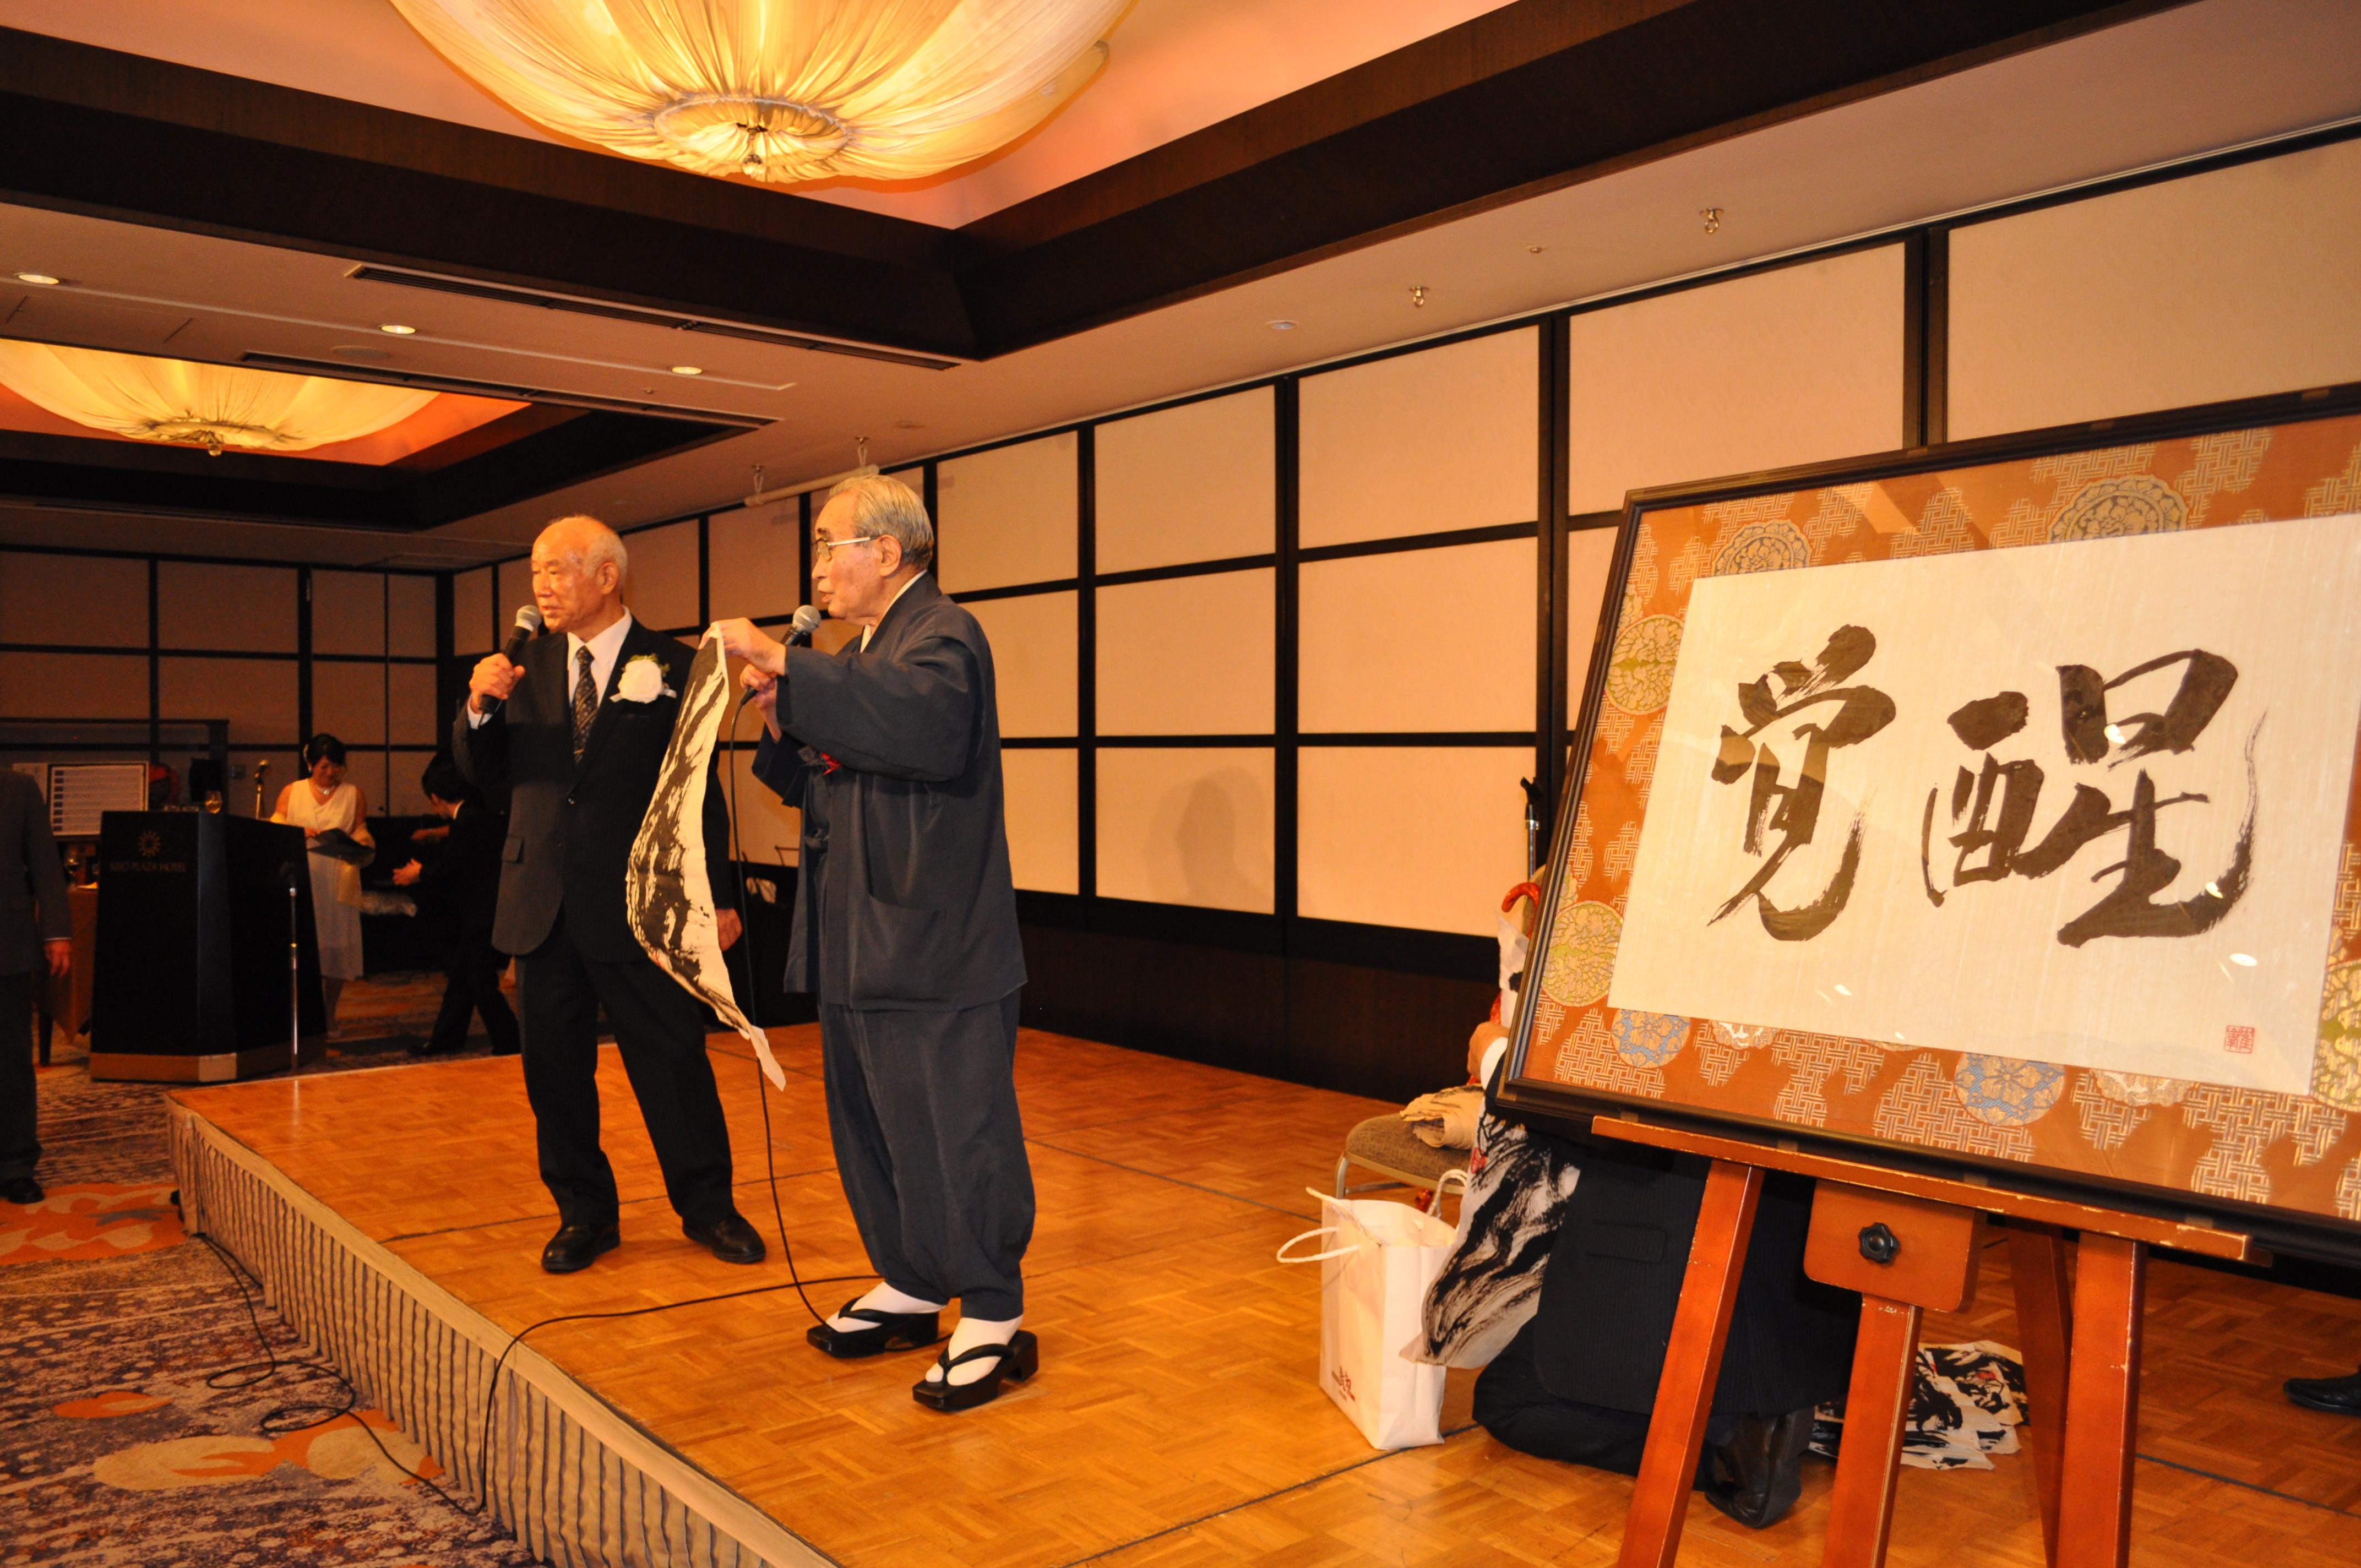 DSC 0552 - 第6回思風会全国大会2018in東京開催